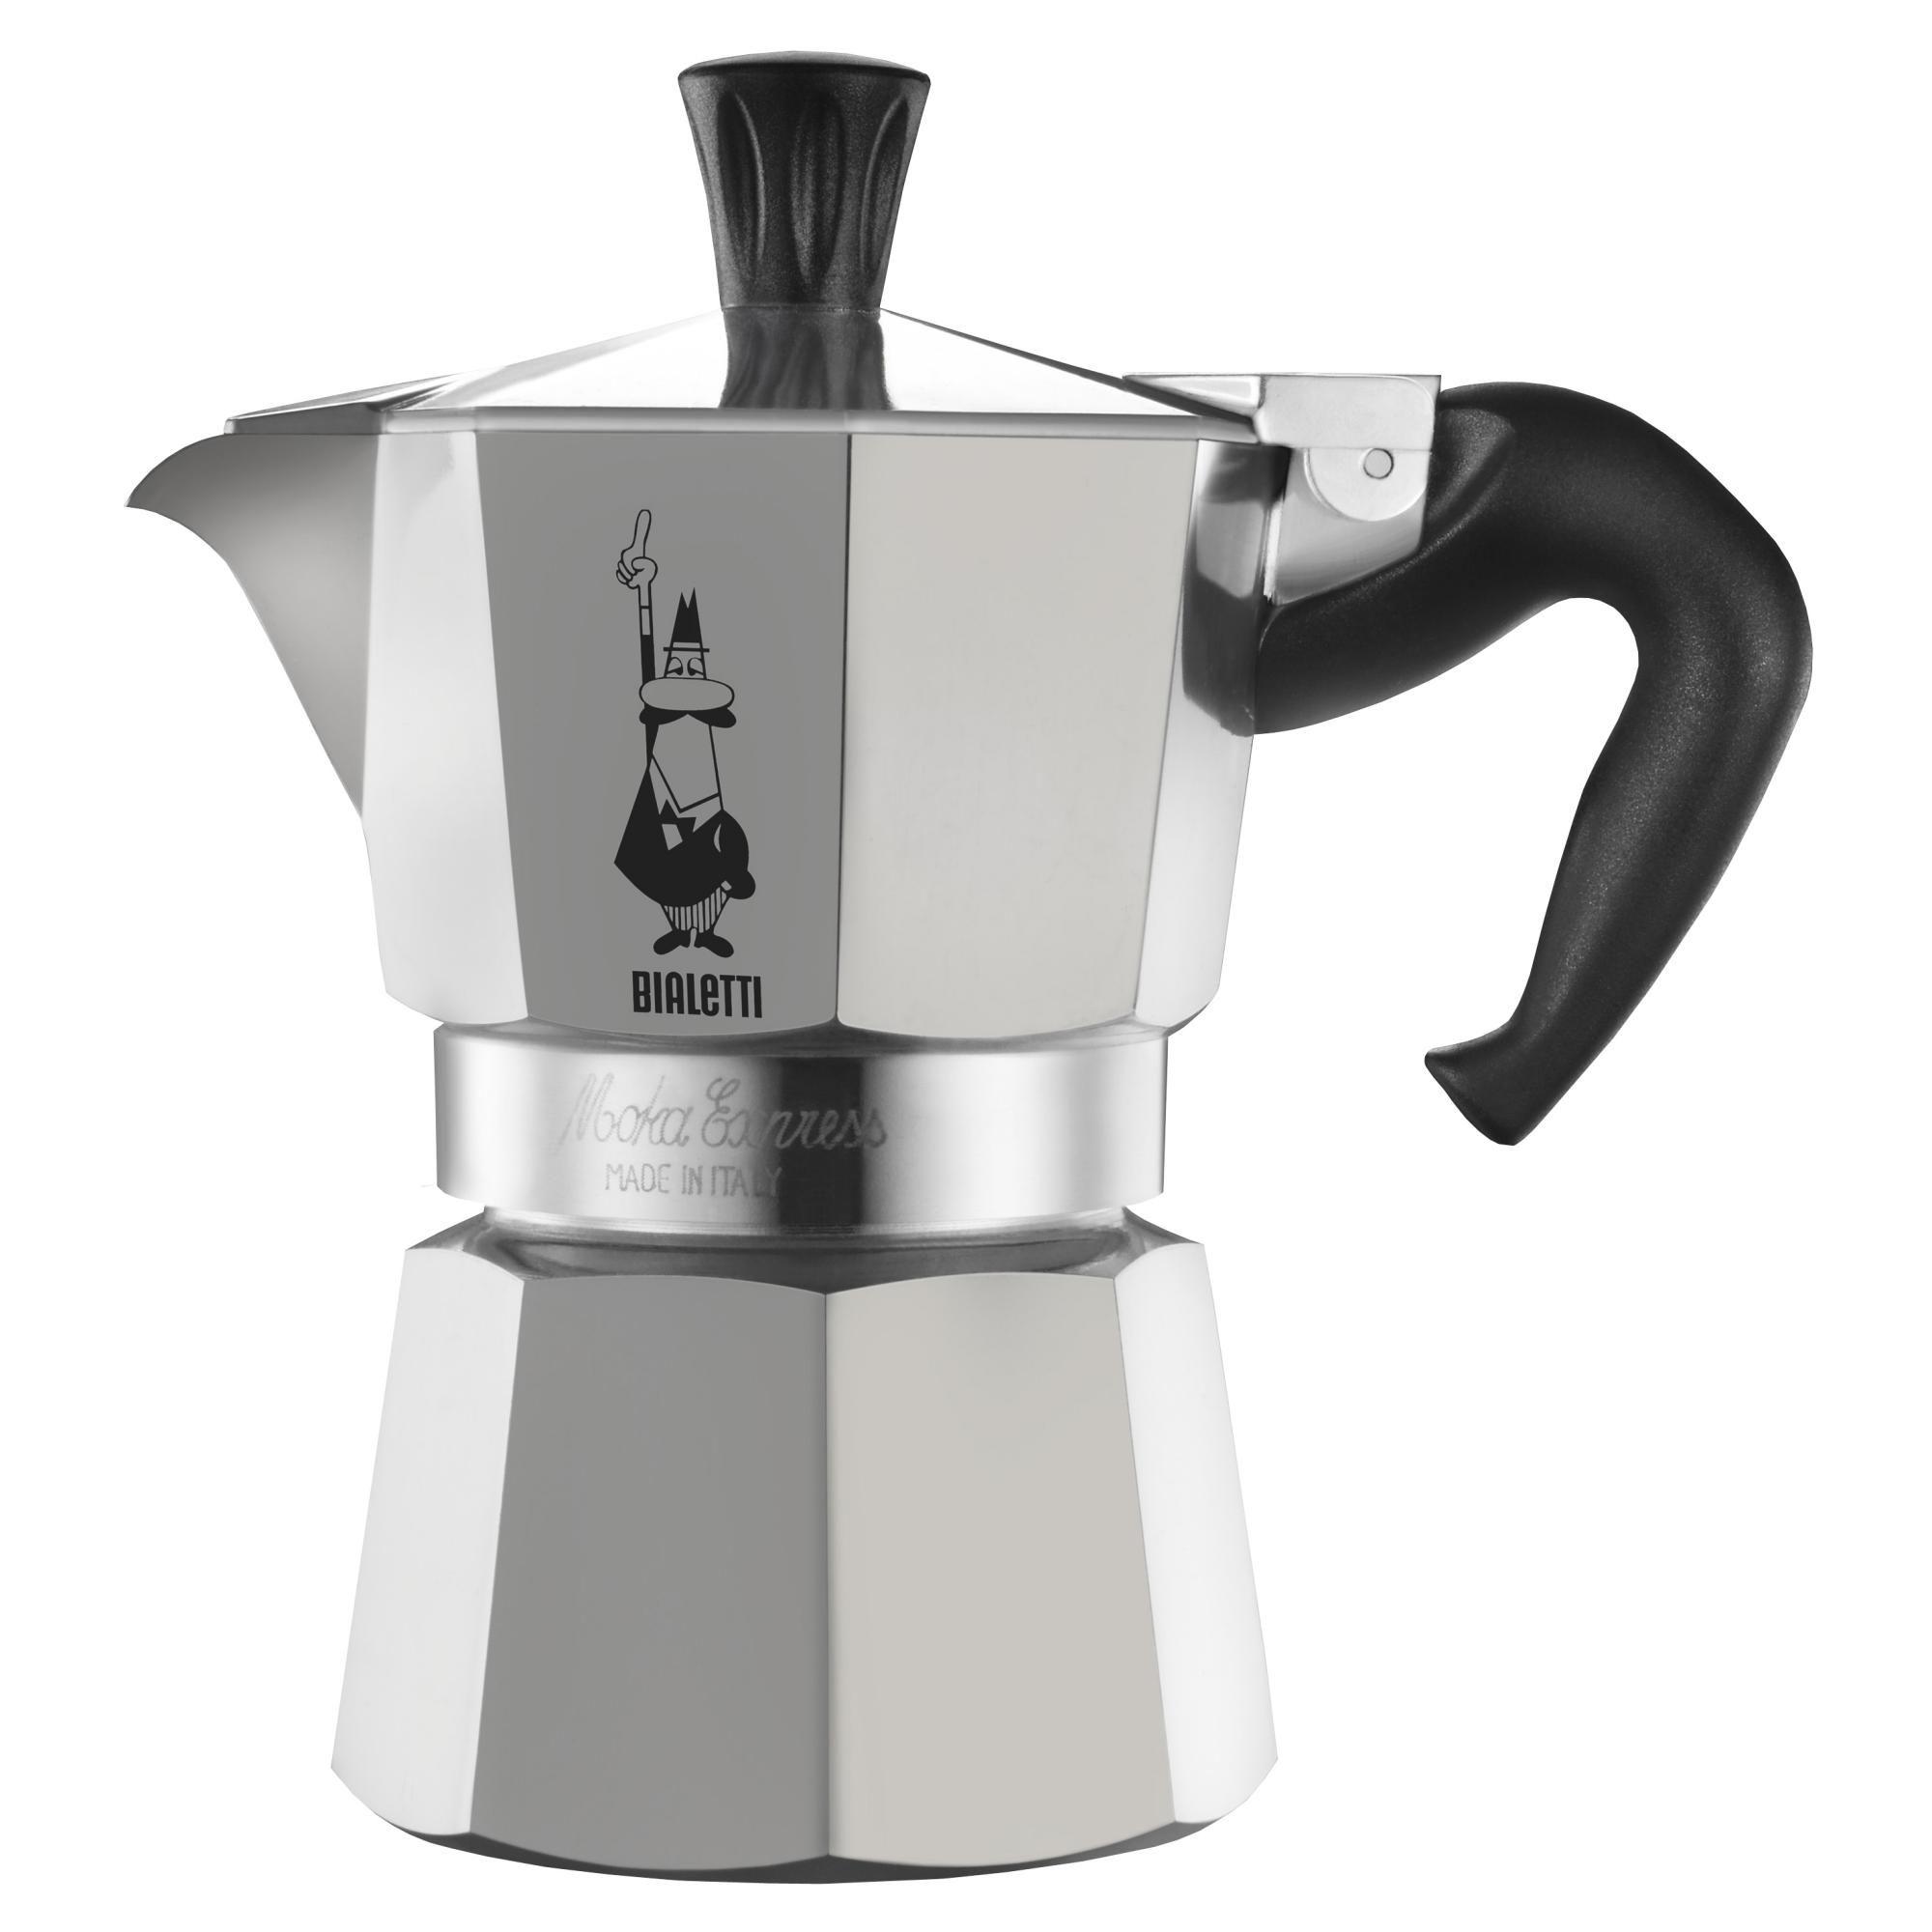 Cabo original para cafeteira Italiana 6 xícaras Bialetti